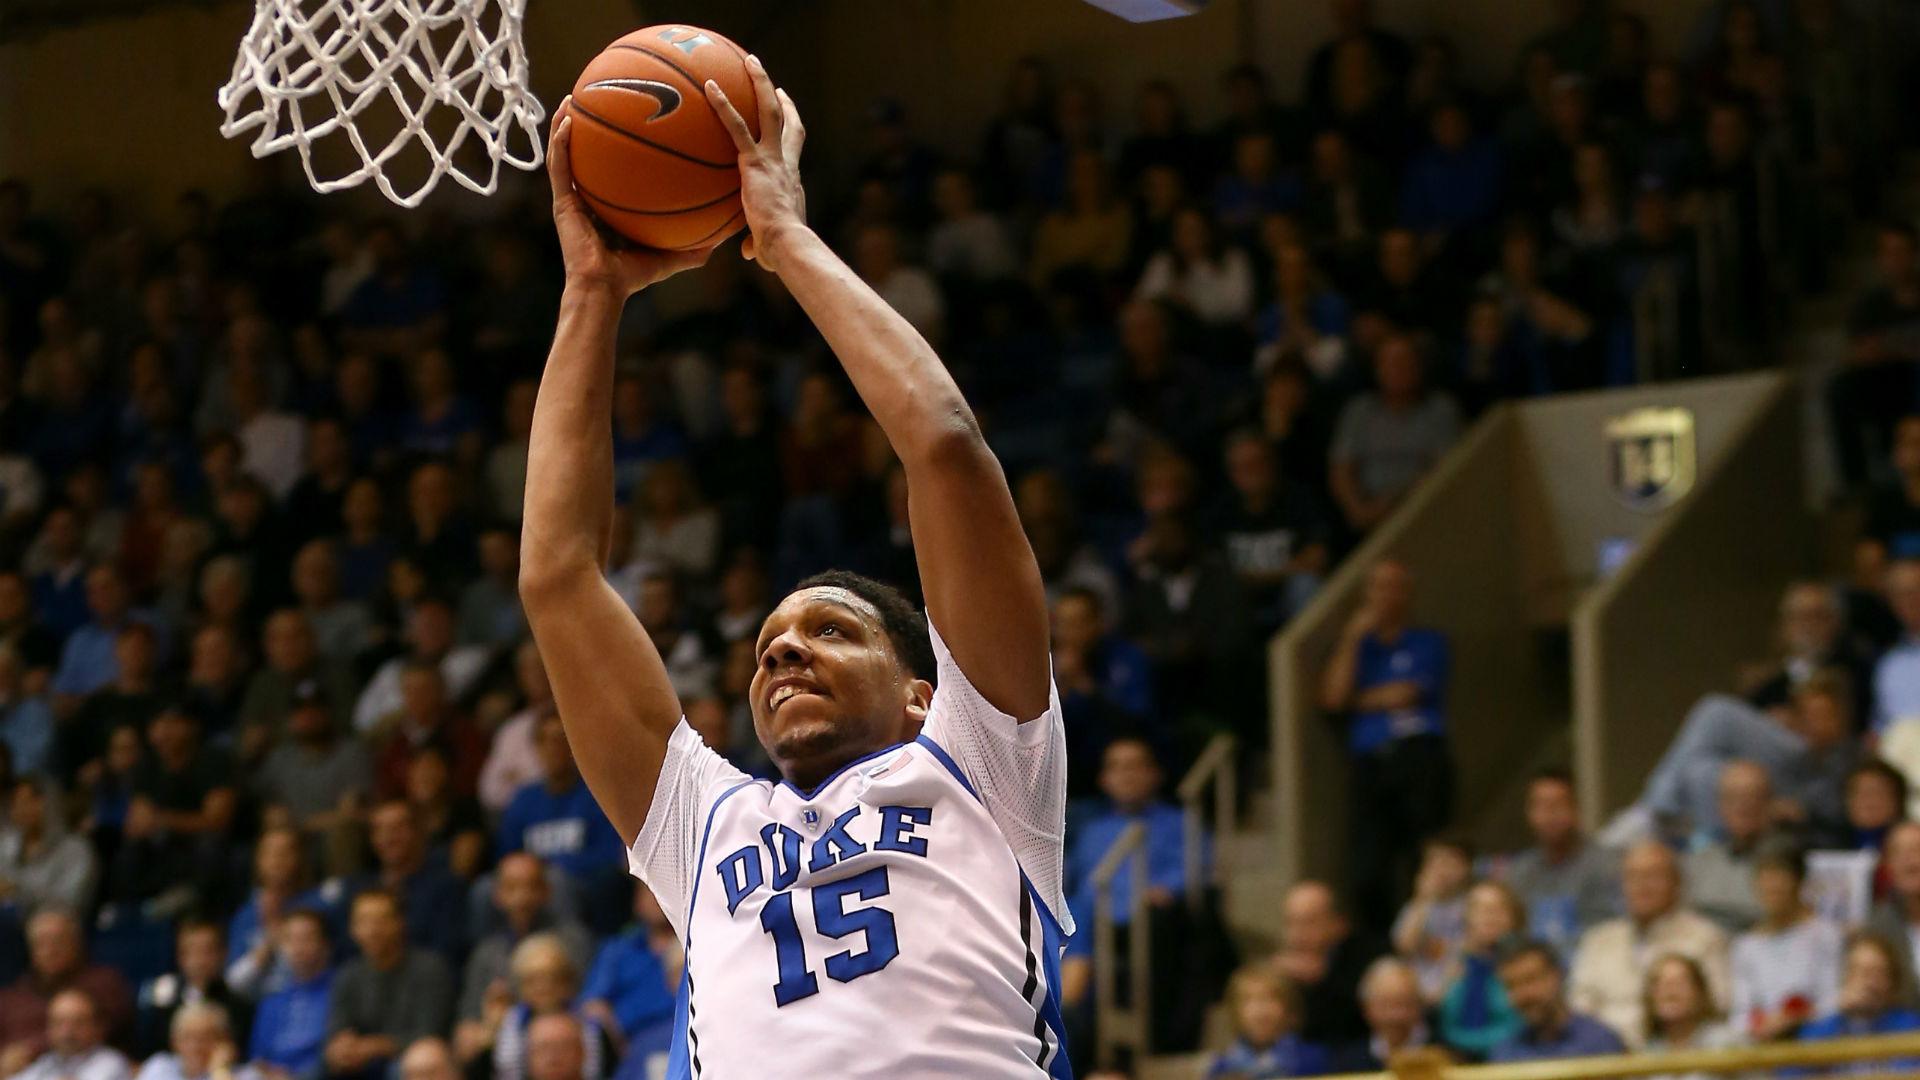 College basketball betting lines and picks – Duke vs. Louisville headlines early Saturday slate